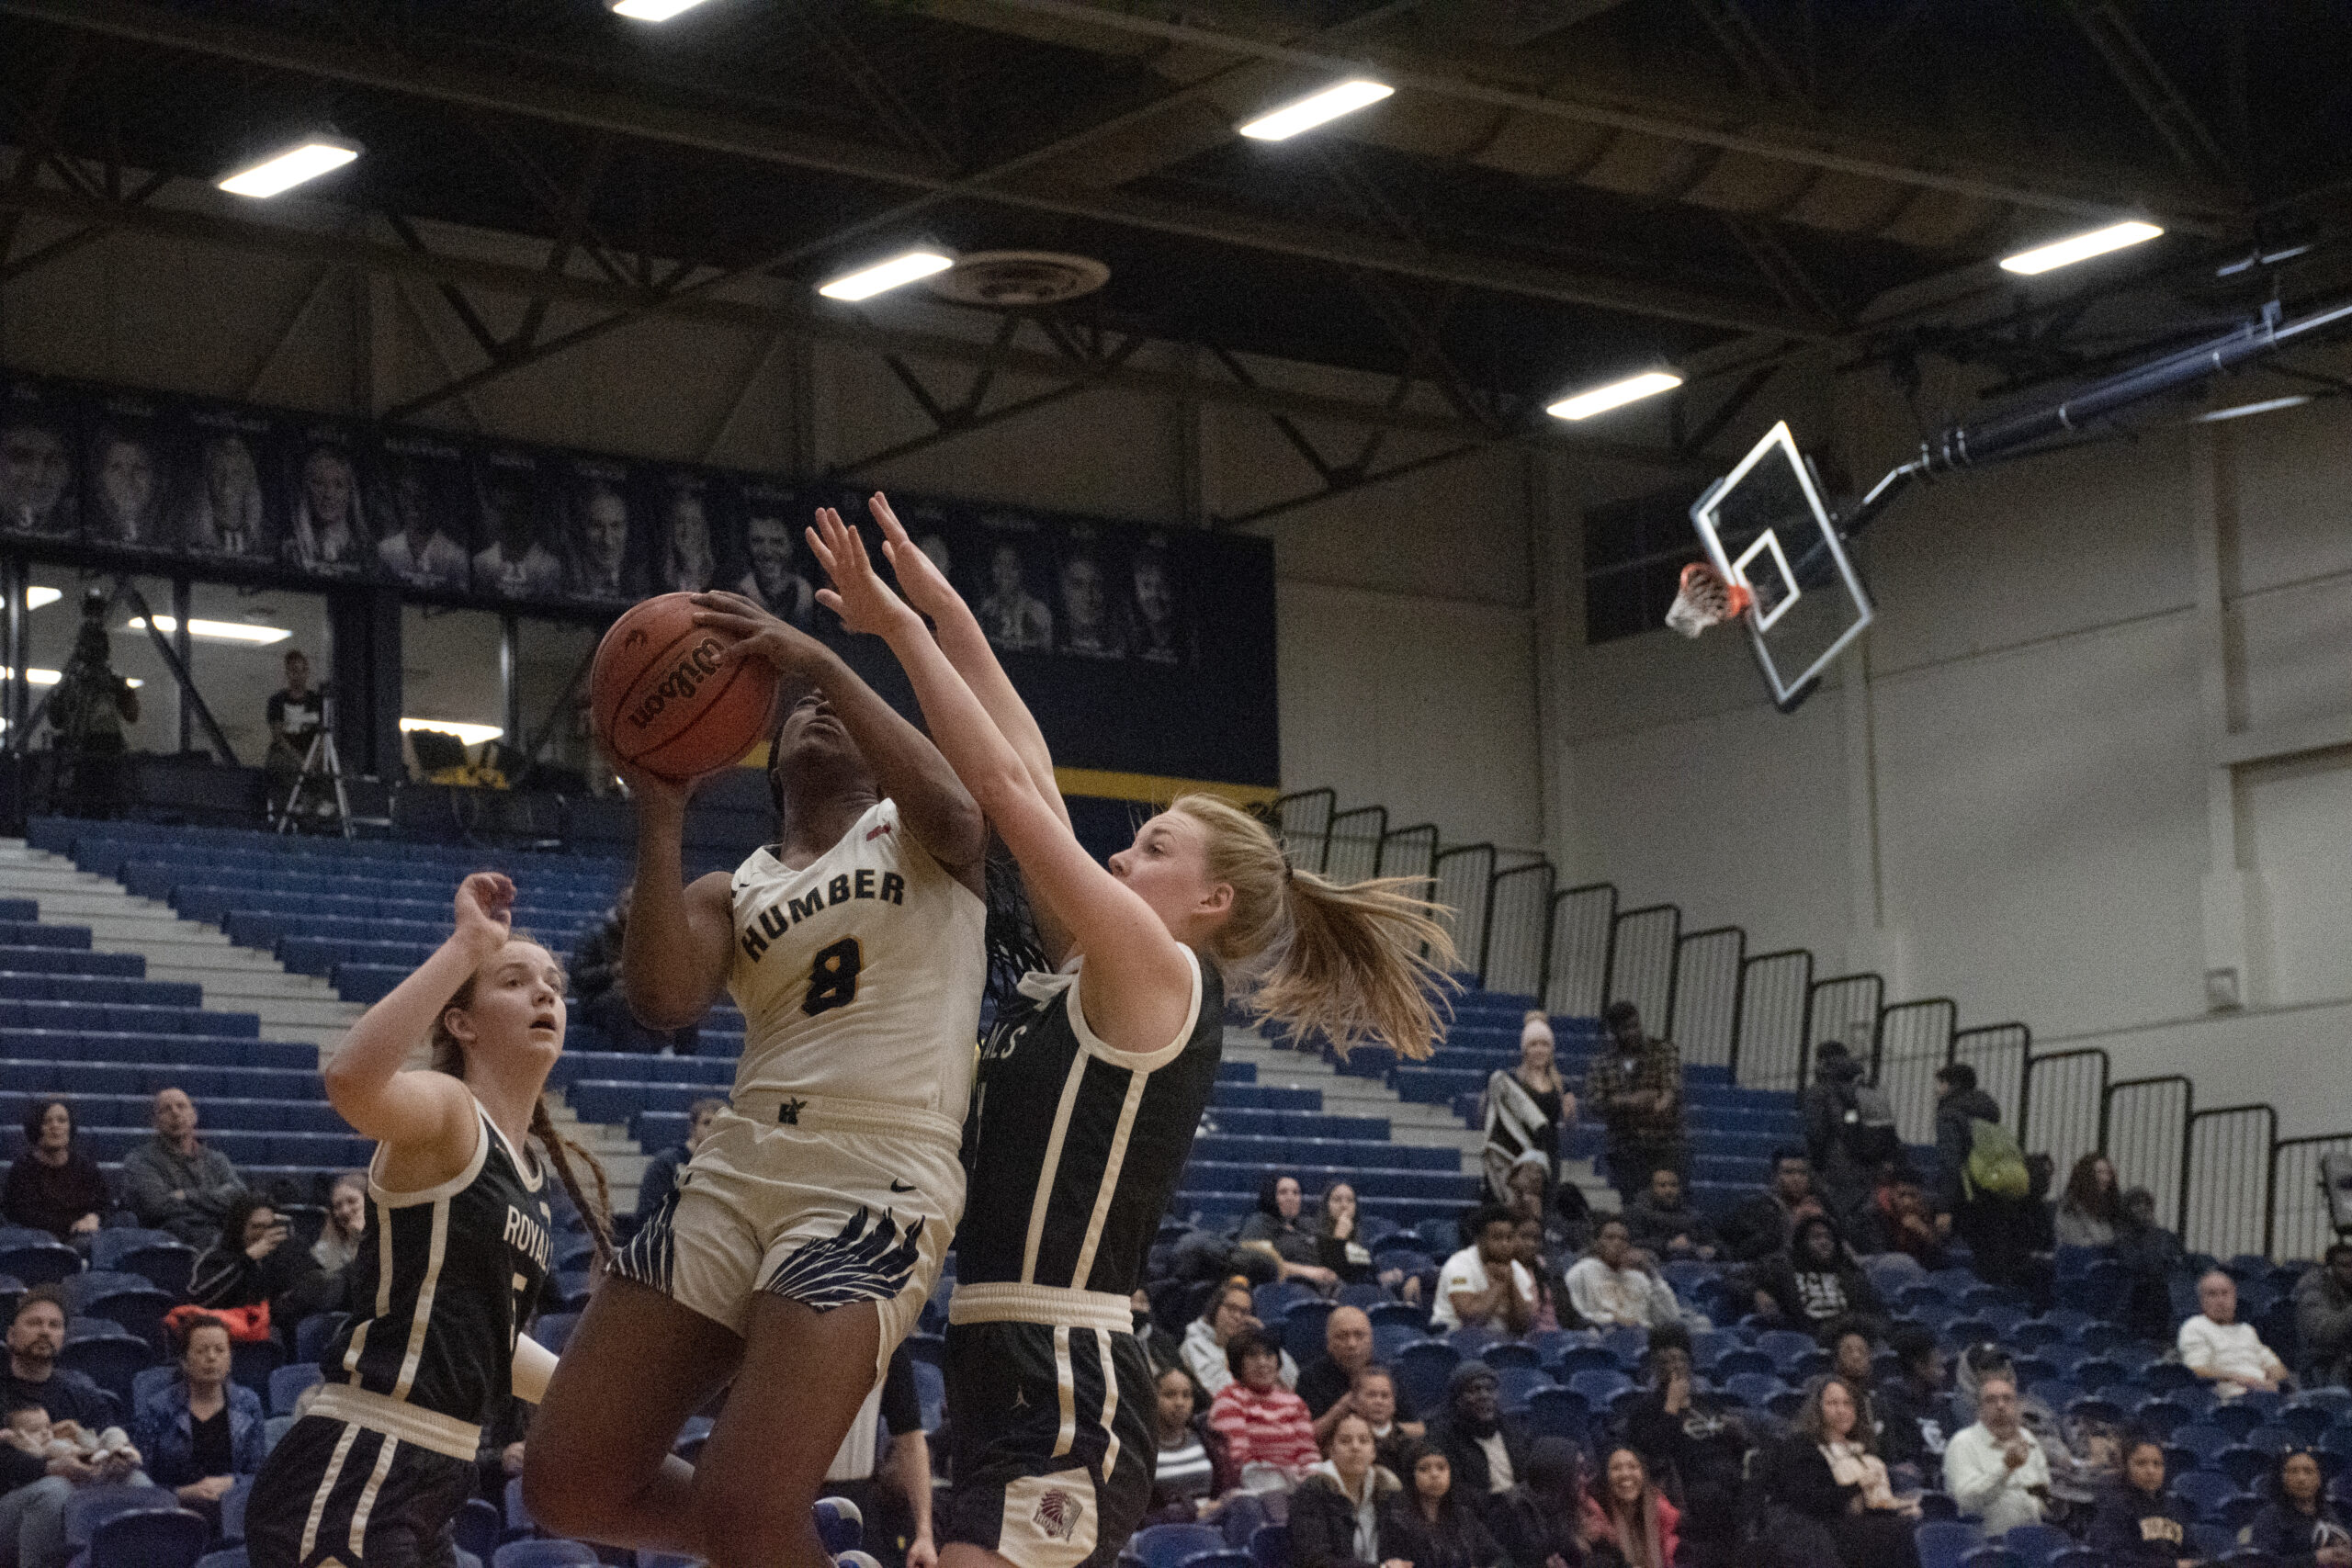 Women's basketball team schools Redeemer by 40